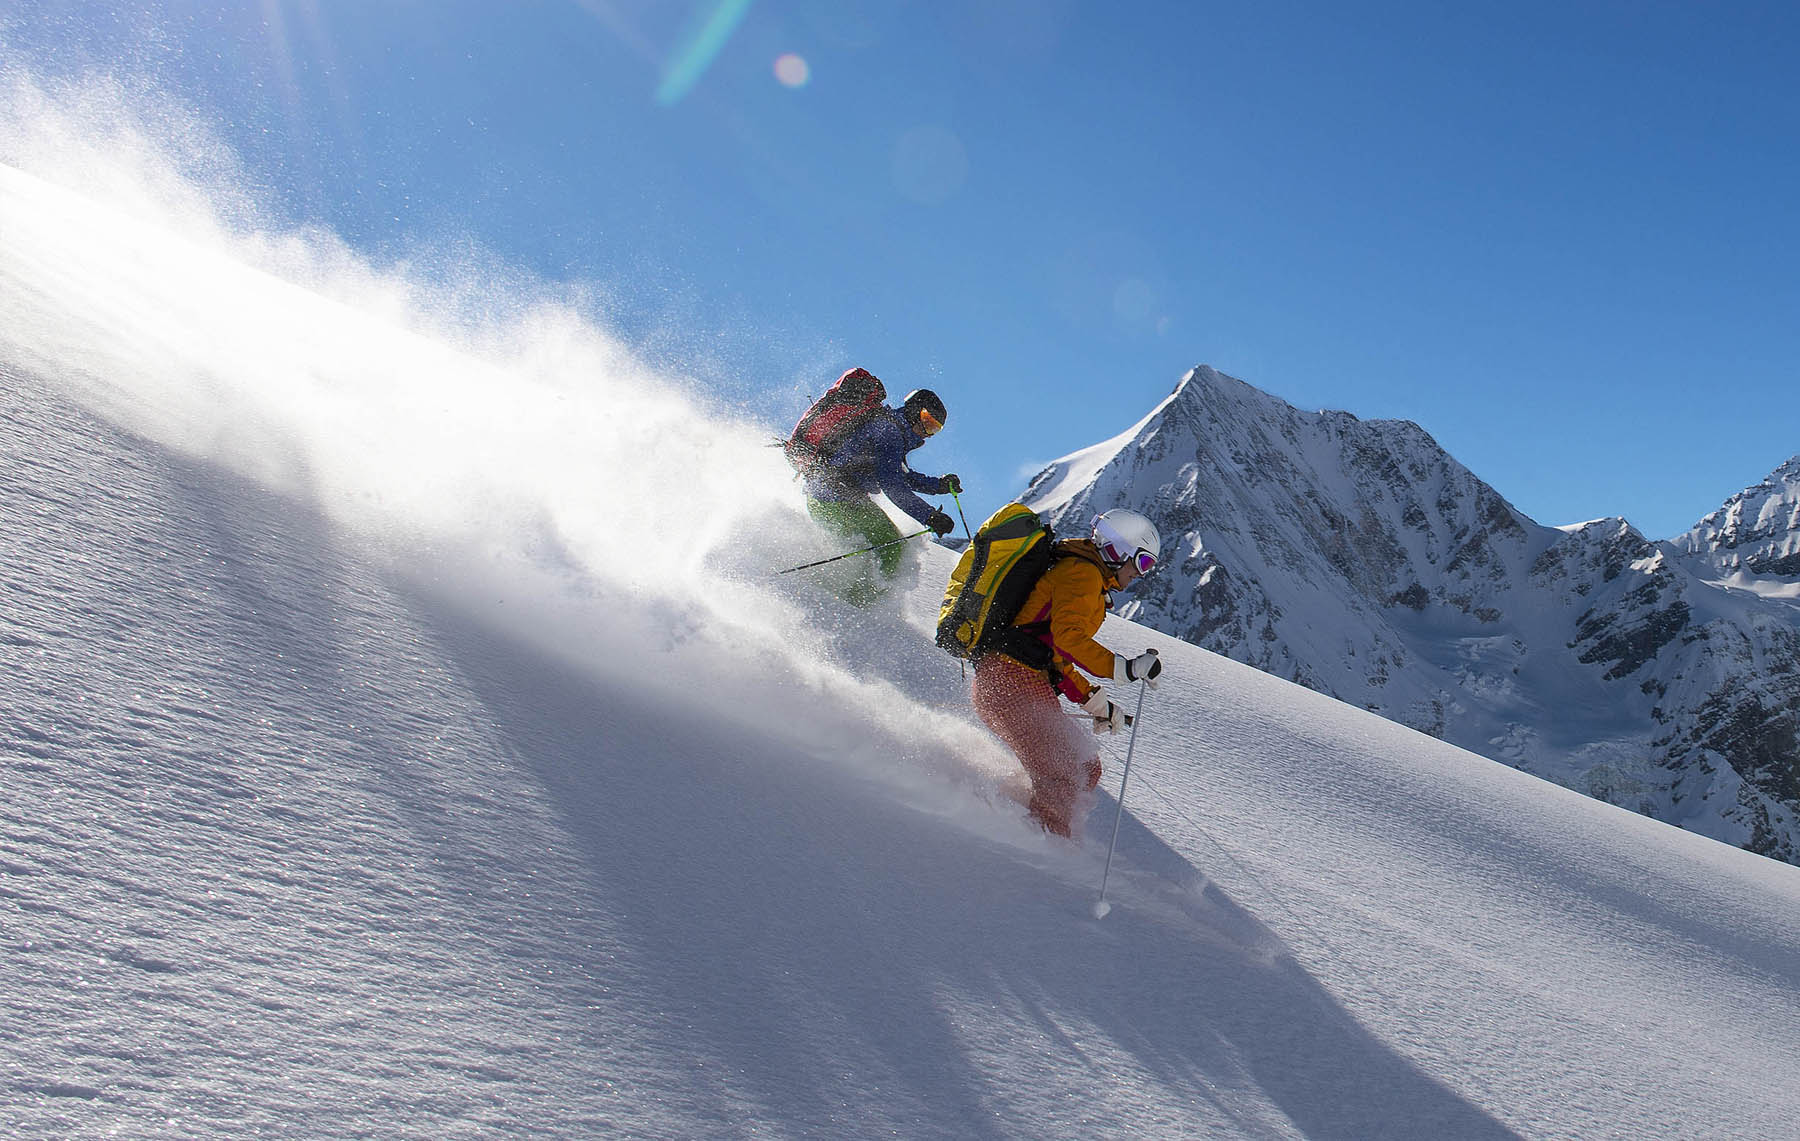 Image newsfeed Grand ski entre France, Suisse et Italie